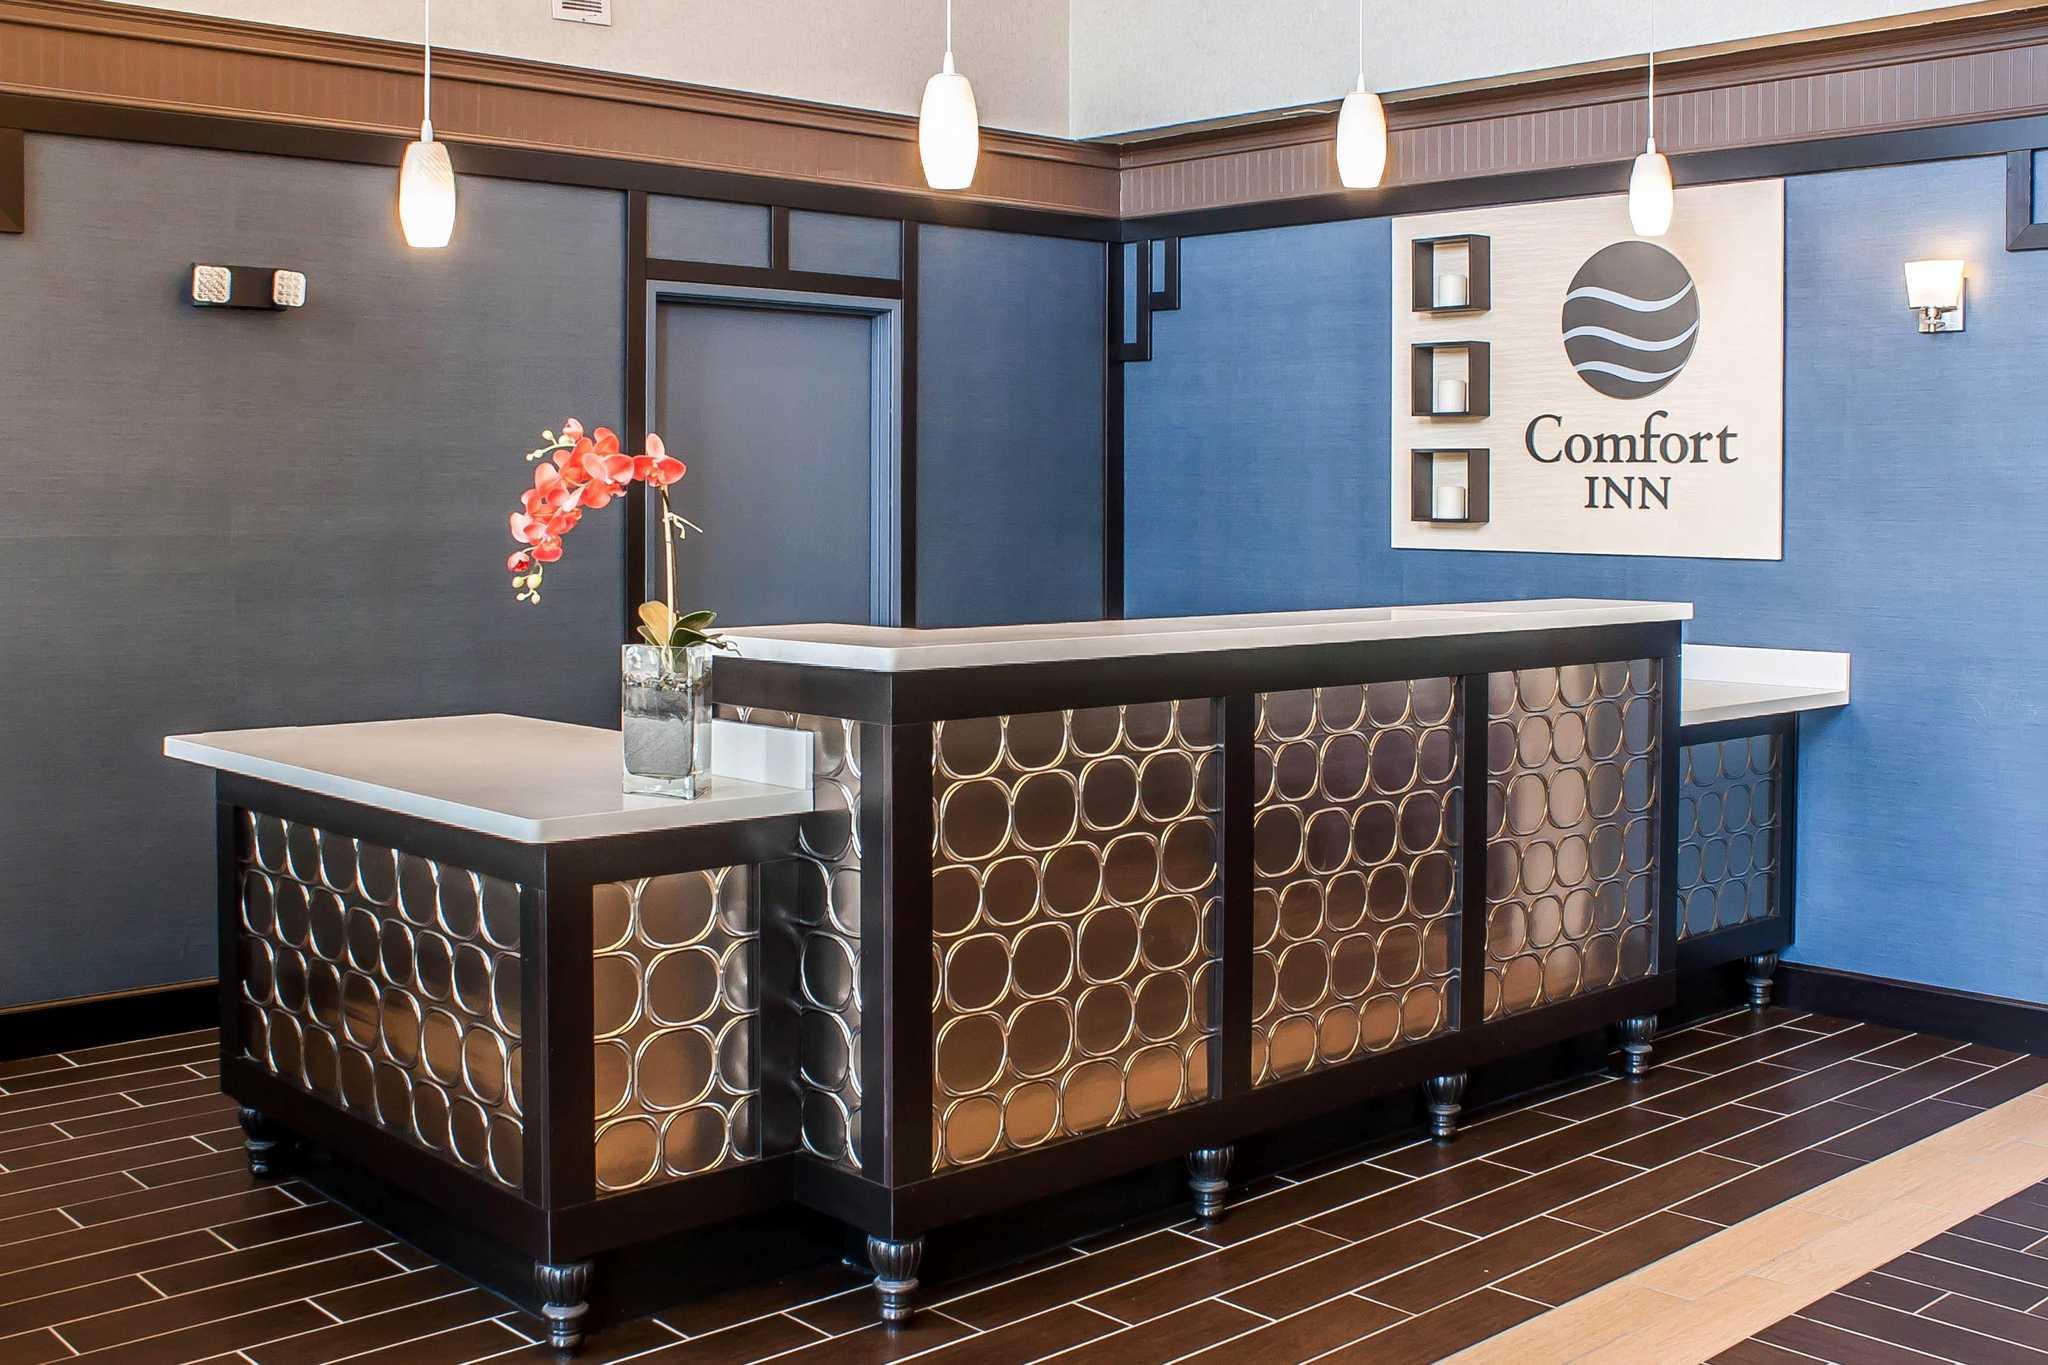 Comfort Inn Federal Way - Seattle image 12